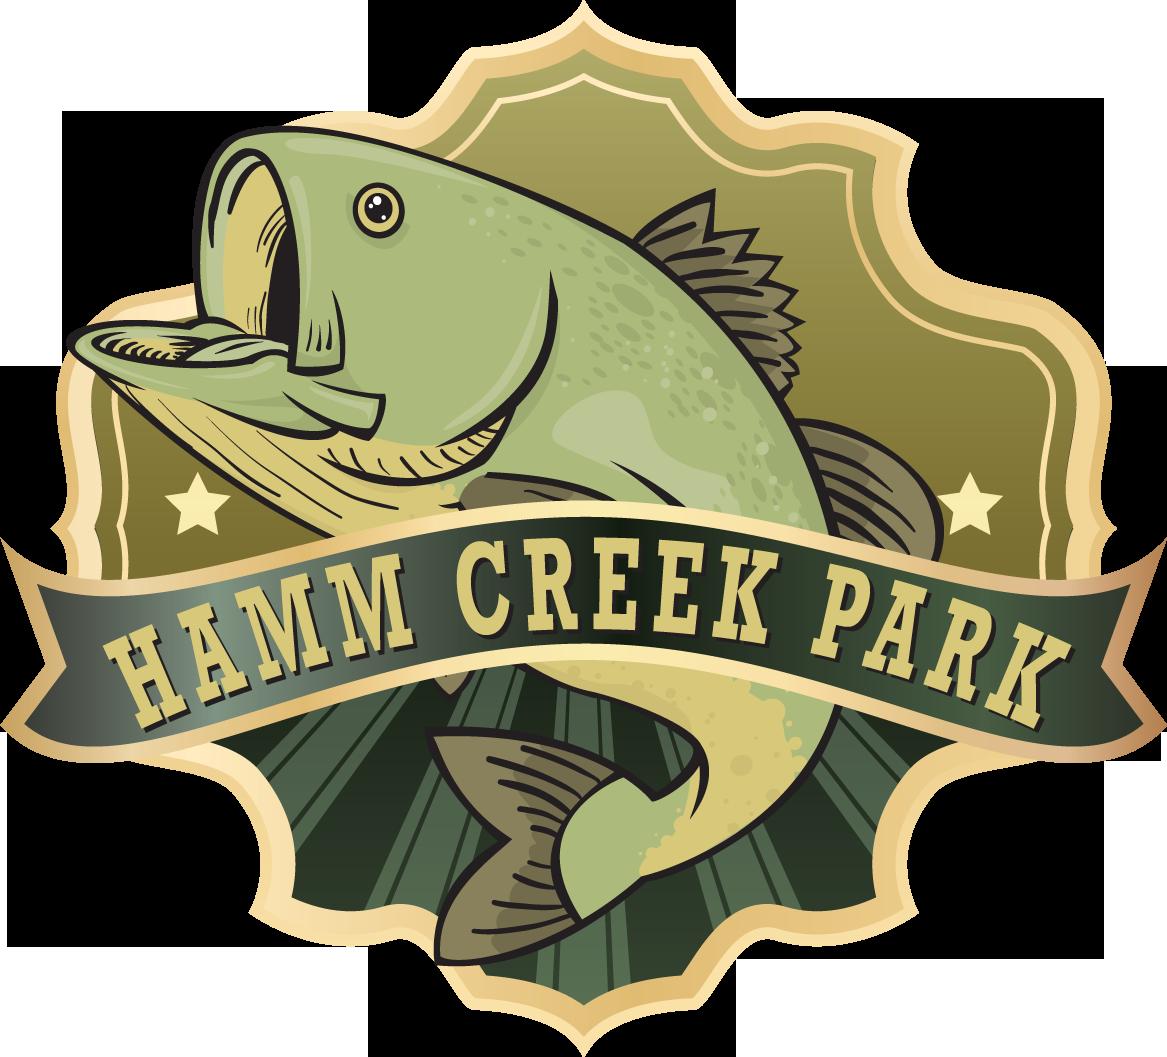 hammcreek-logo01